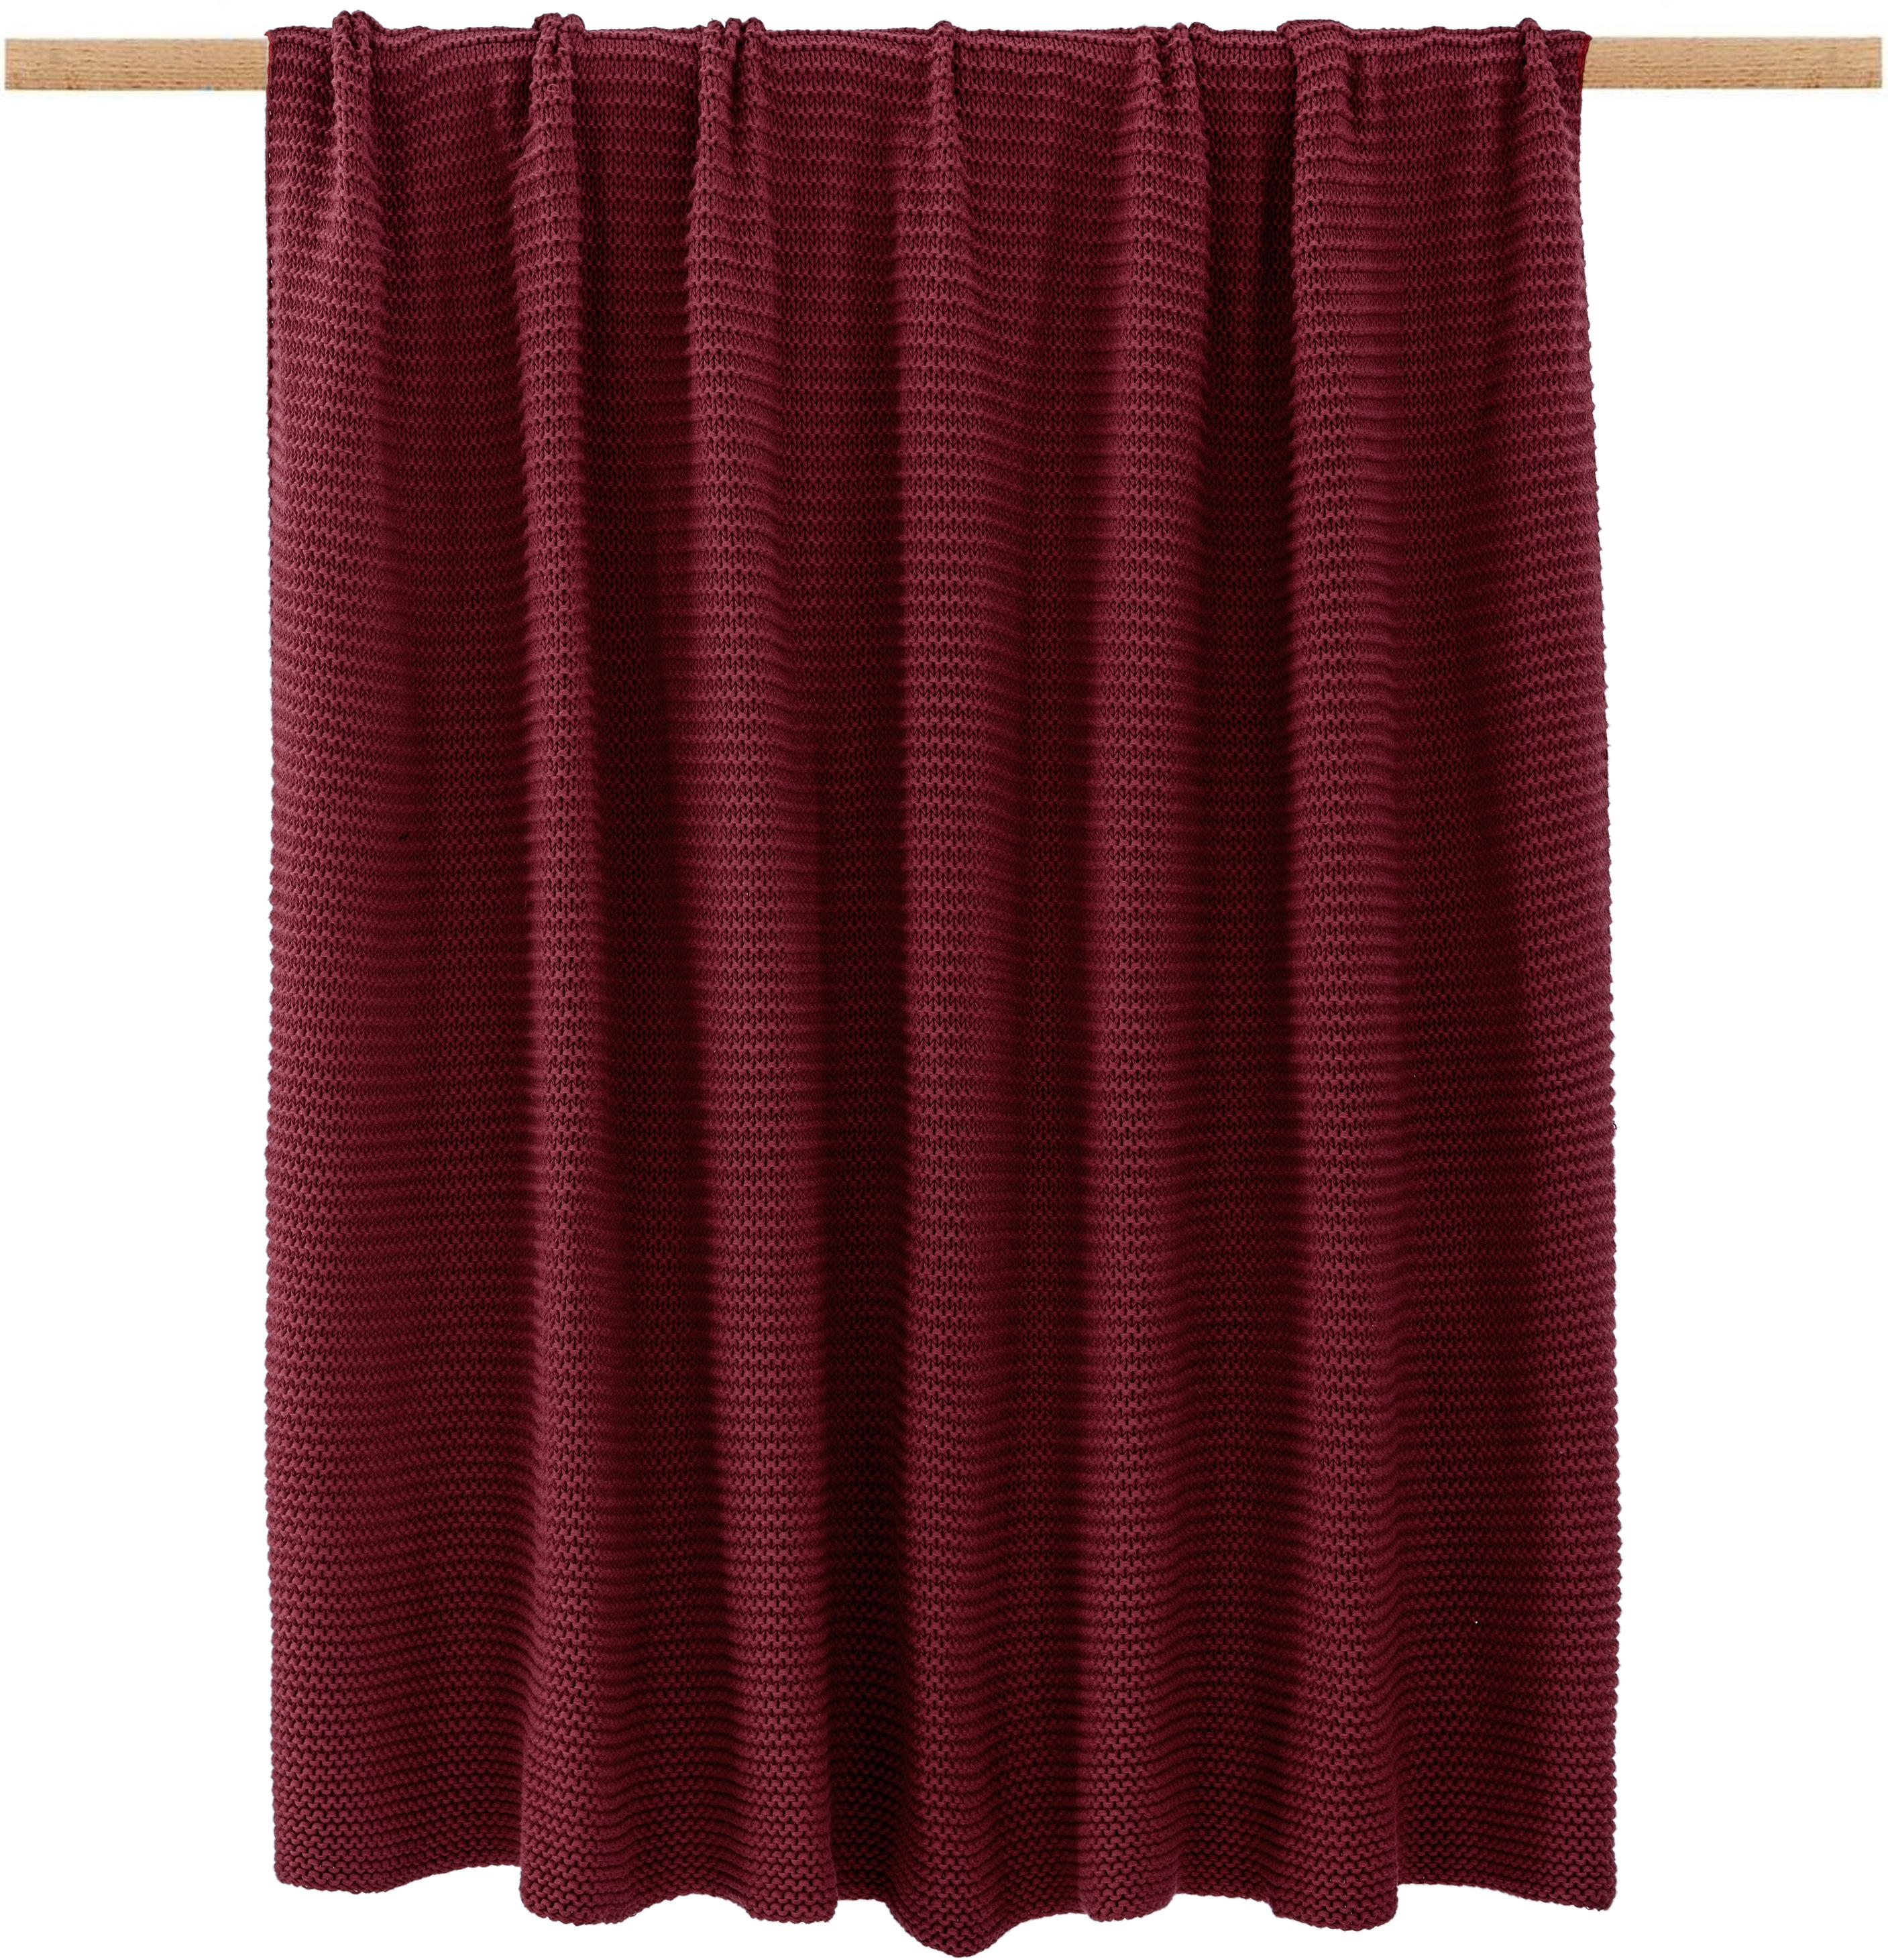 Manta de punto Aladyn, 100%algodón, Rojo oscuro, An 150 x L 200 cm